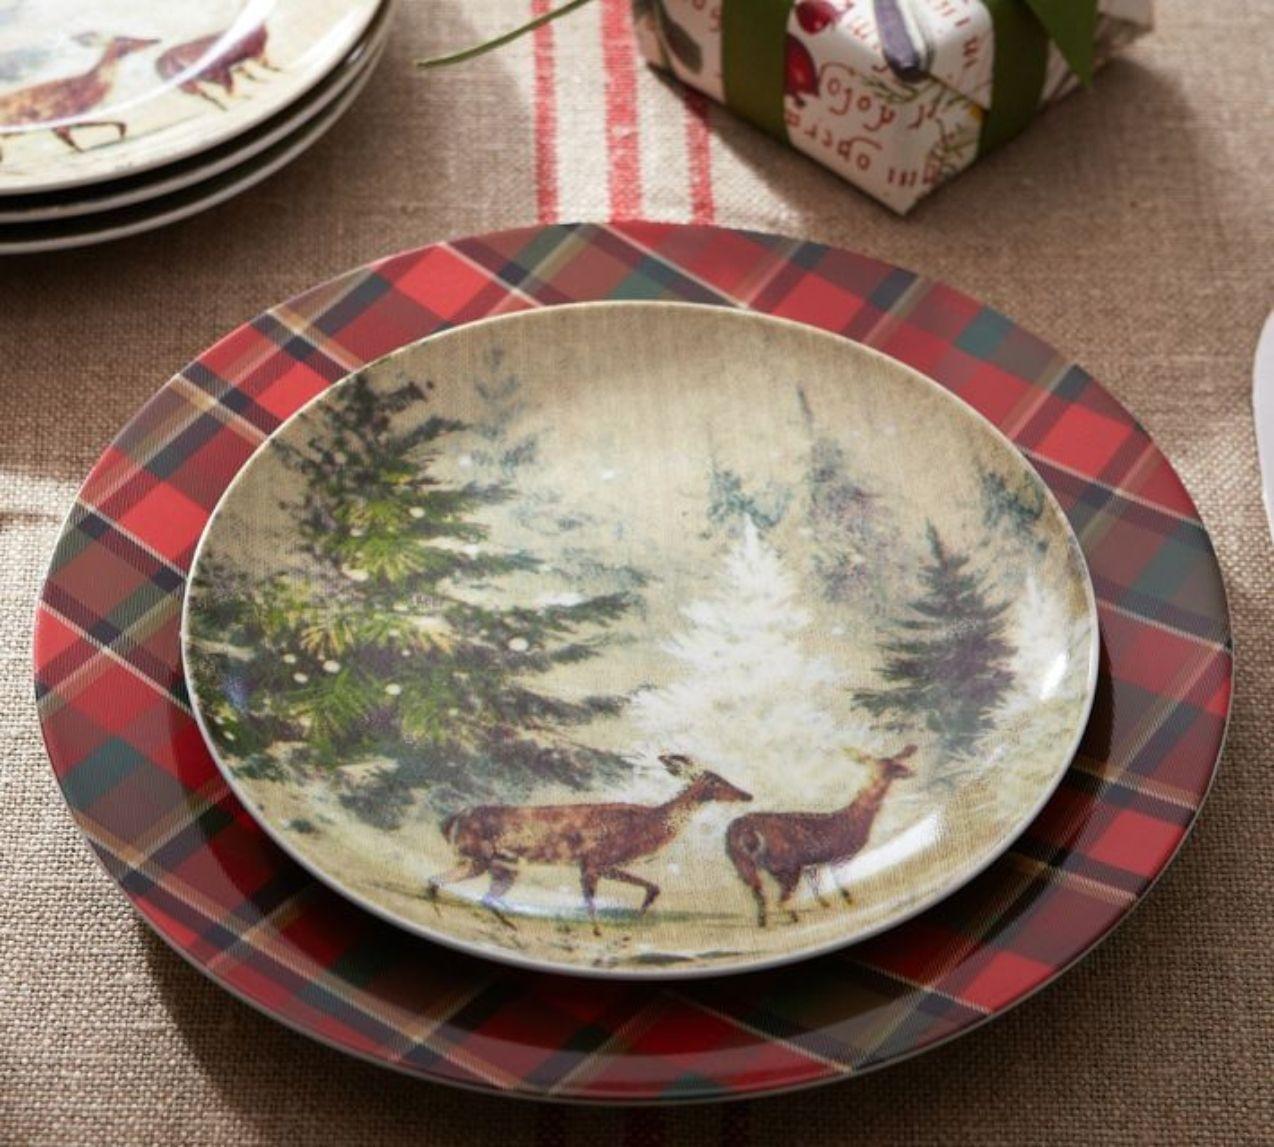 Set of 4 decorative plates 4 & Set Of 4 Decorative Plates - Foter